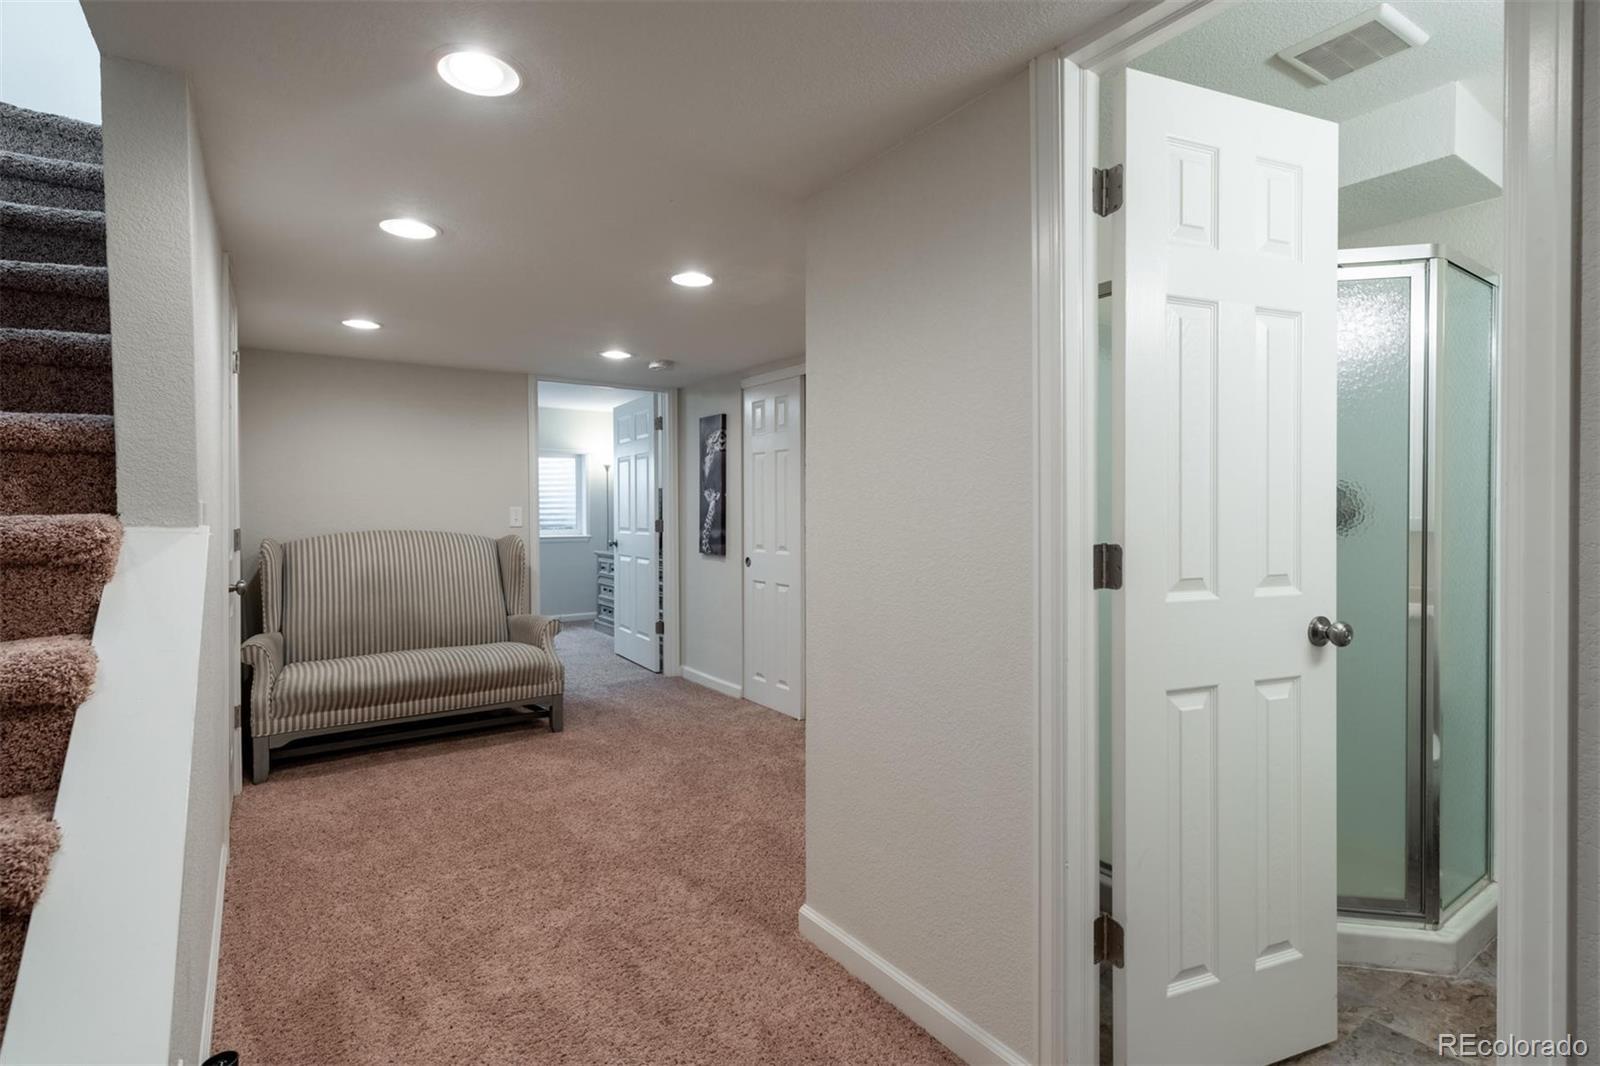 MLS# 3695184 - 21 - 21174 E Scott Place, Denver, CO 80249